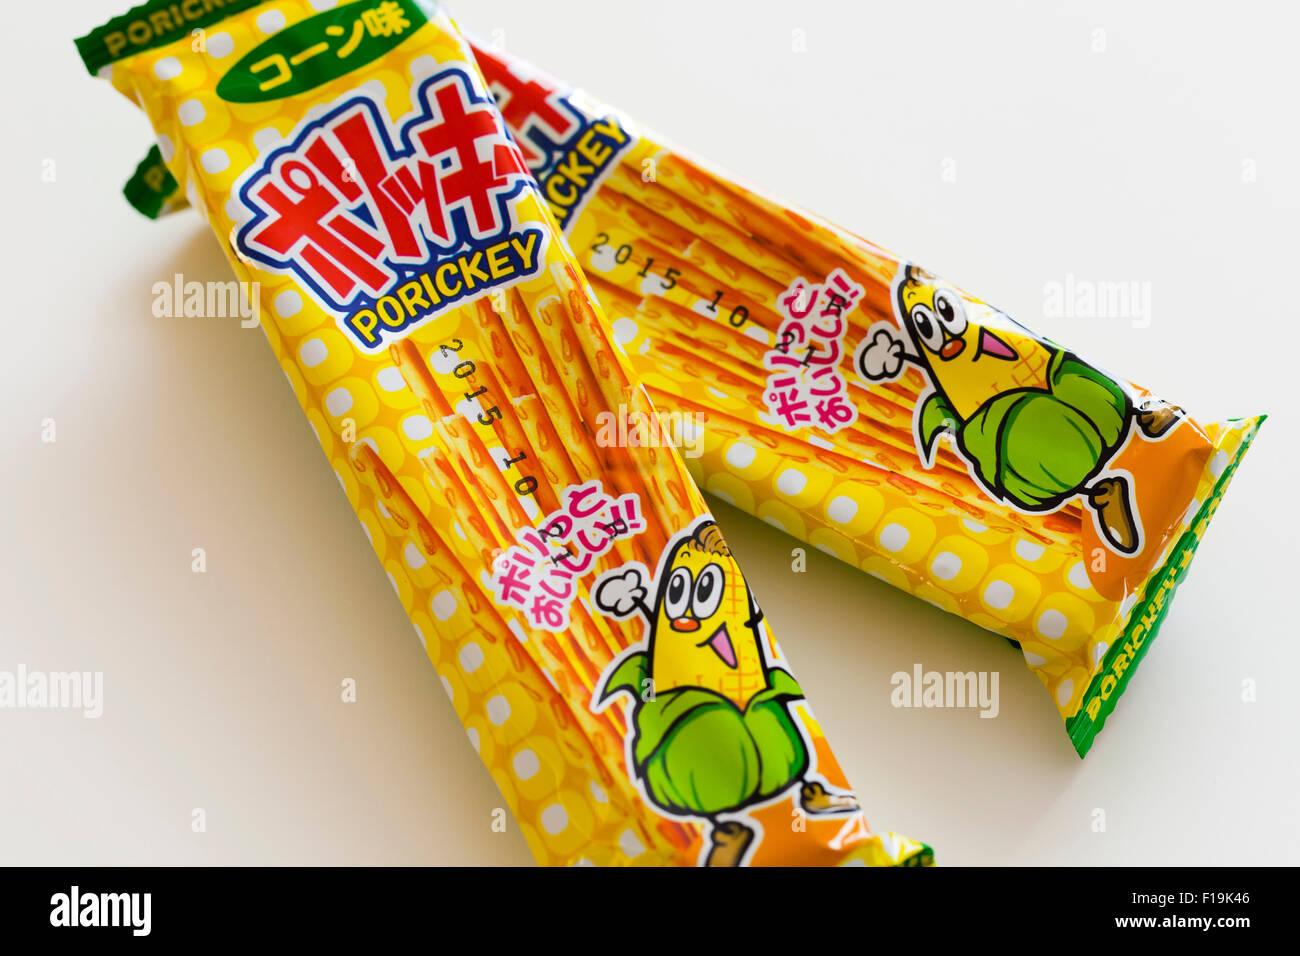 Porickey corn flavored pretzel sticks in Japanese packaging - Stock Image